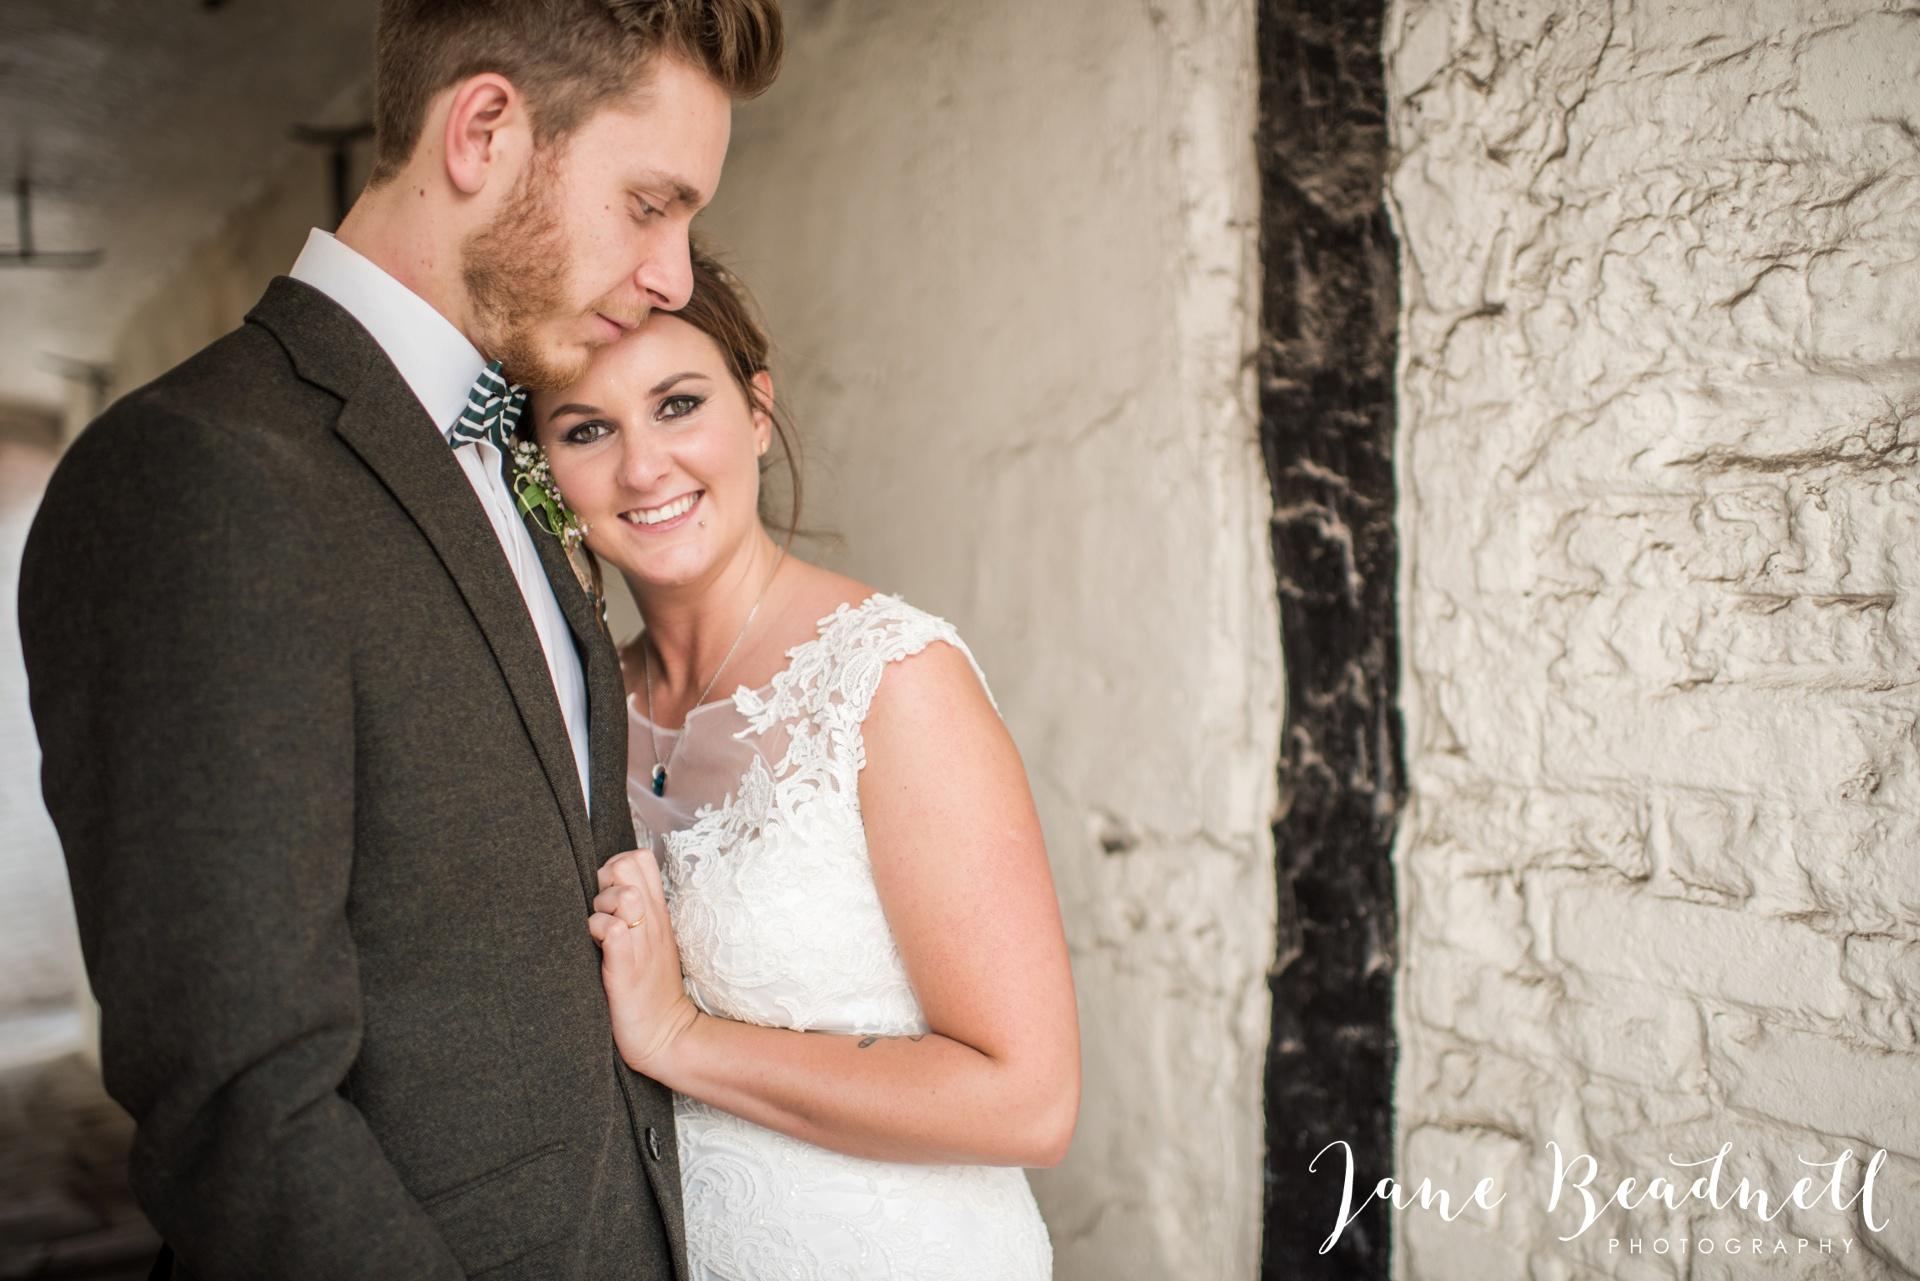 Jane Beadnell fine art wedding photographer The Old Deanery Ripon_0080